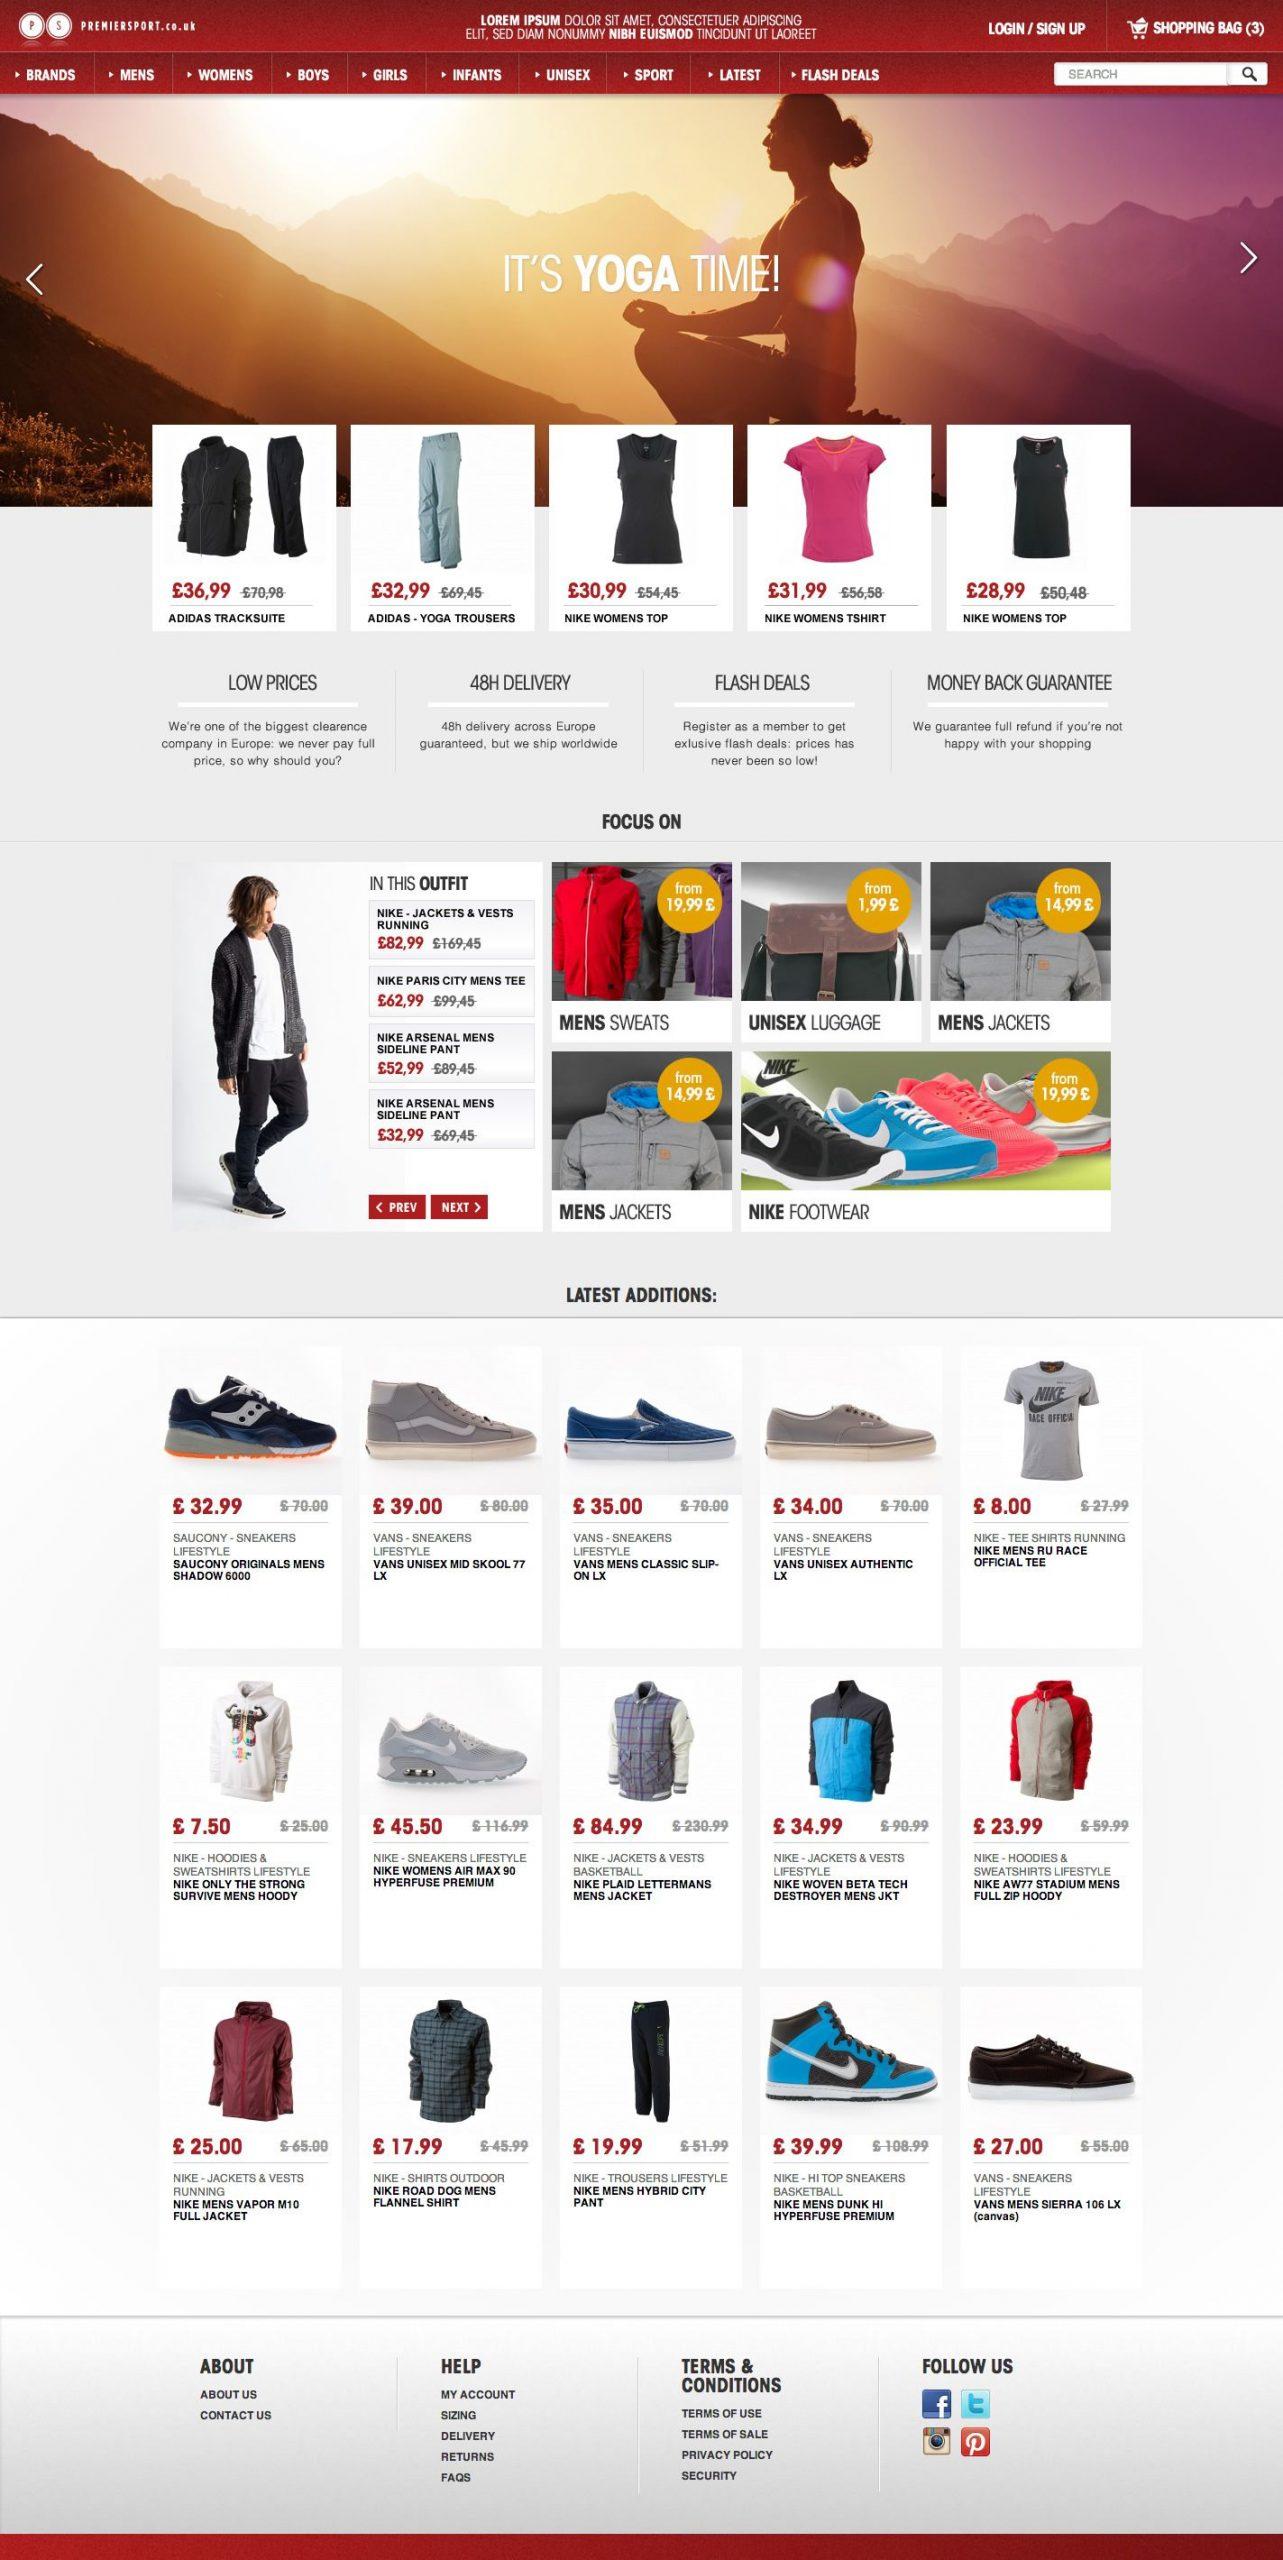 Mẫu website thời trang thể thao